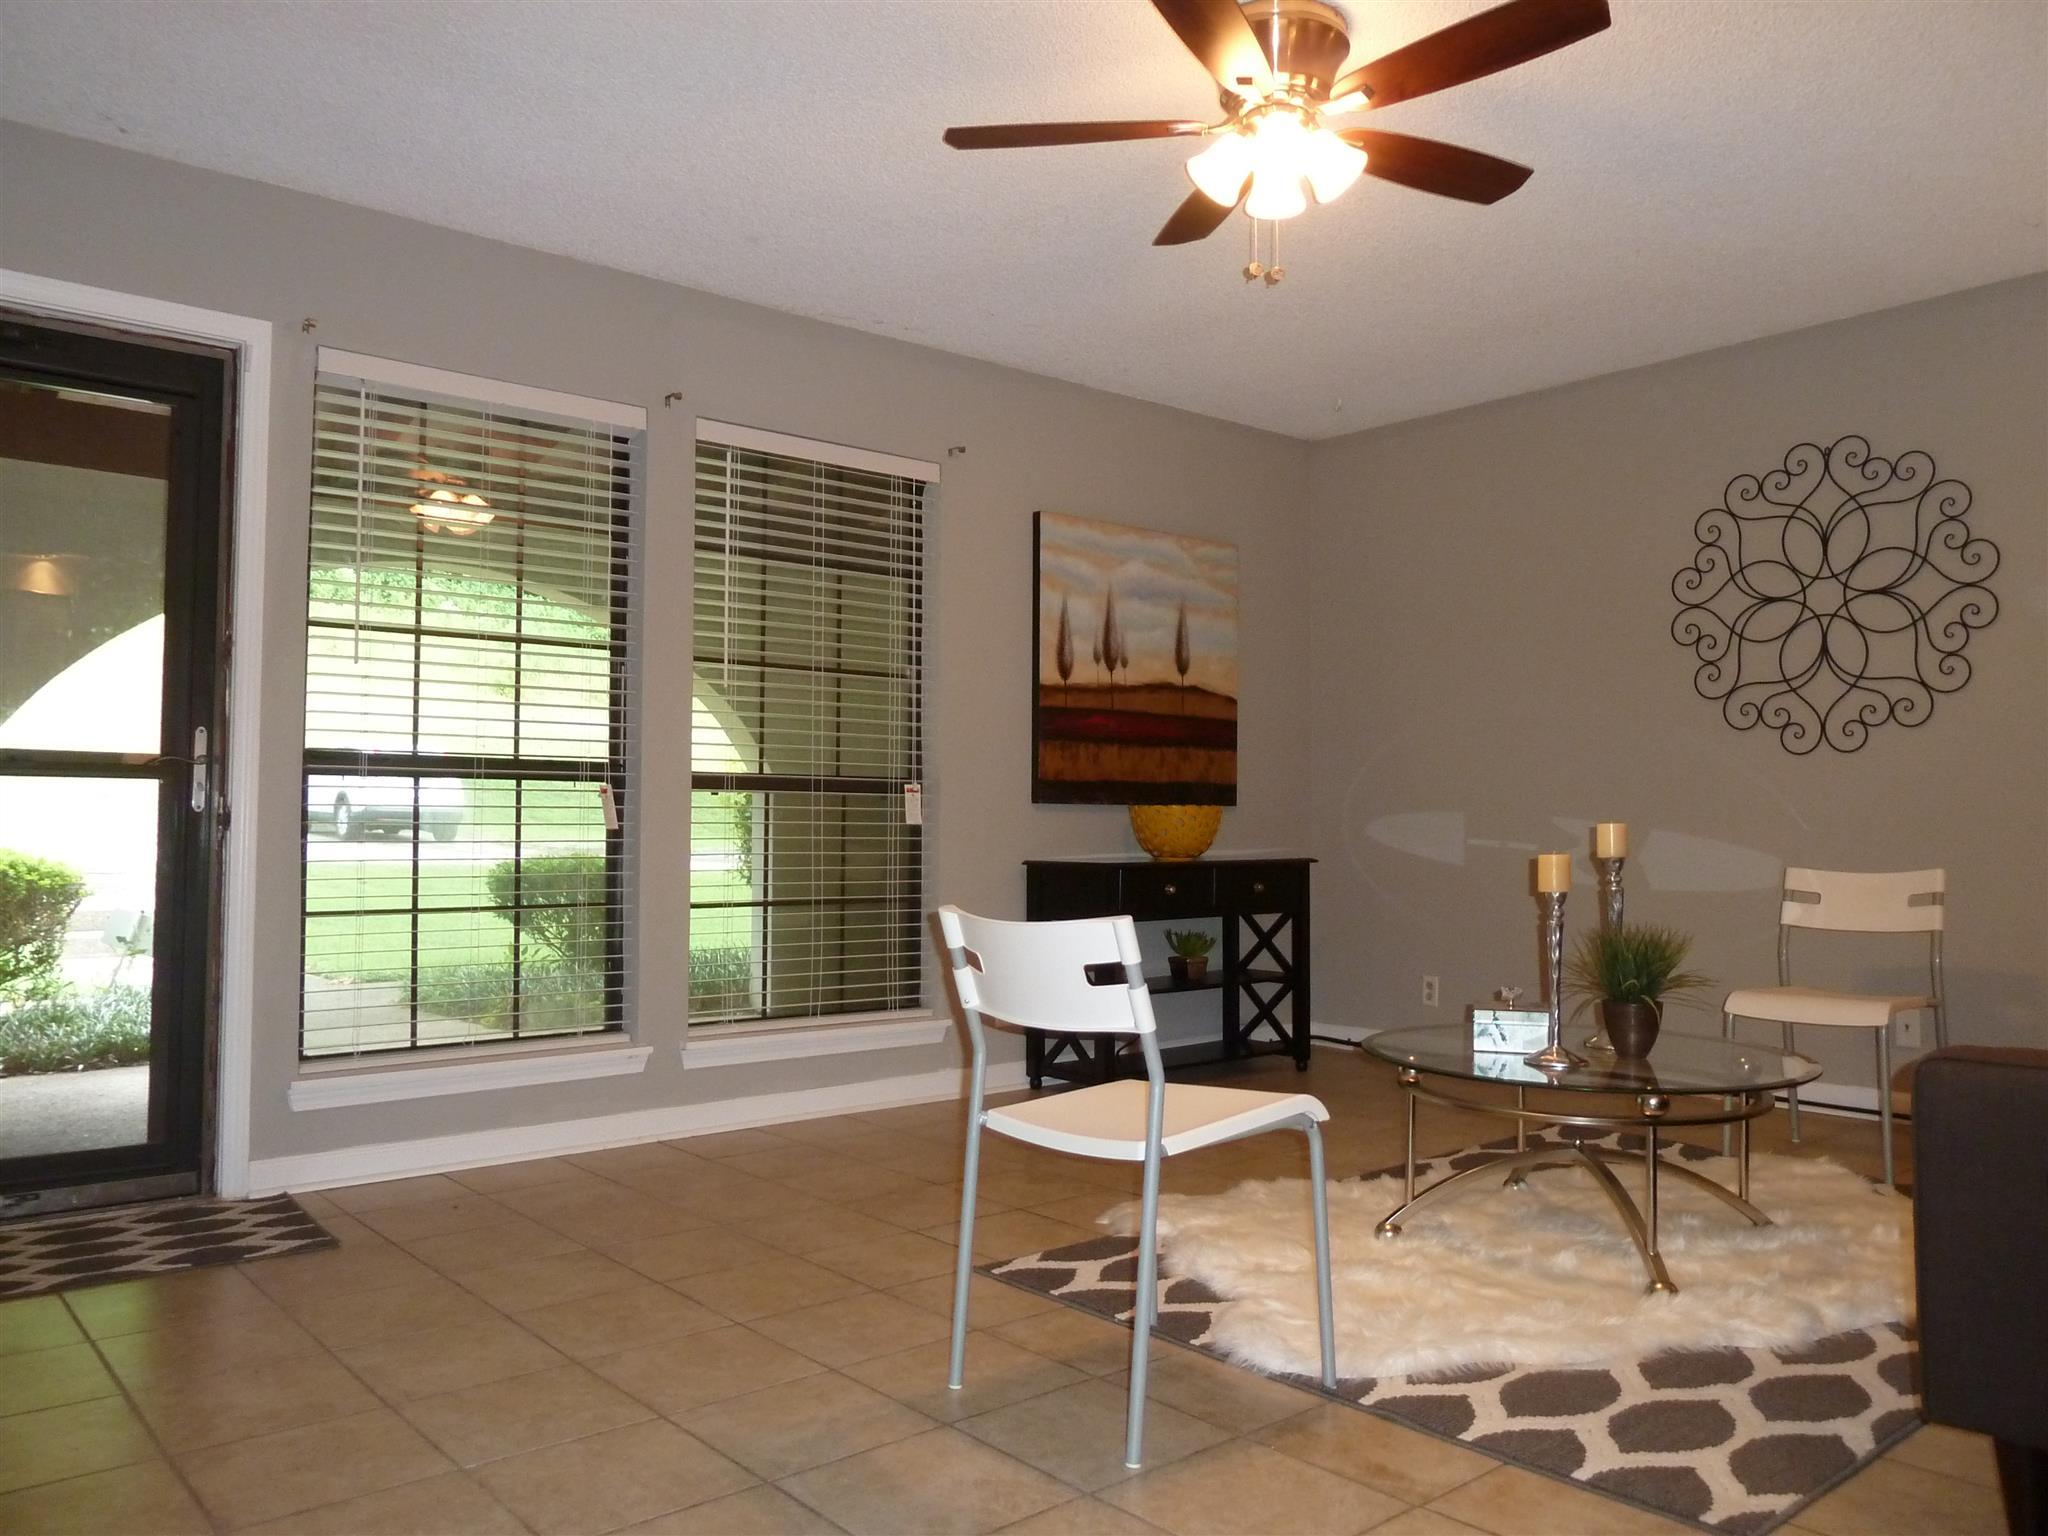 210 Old Hickory Blvd Apt 2, Nashville, TN 37221 - Nashville, TN real estate listing